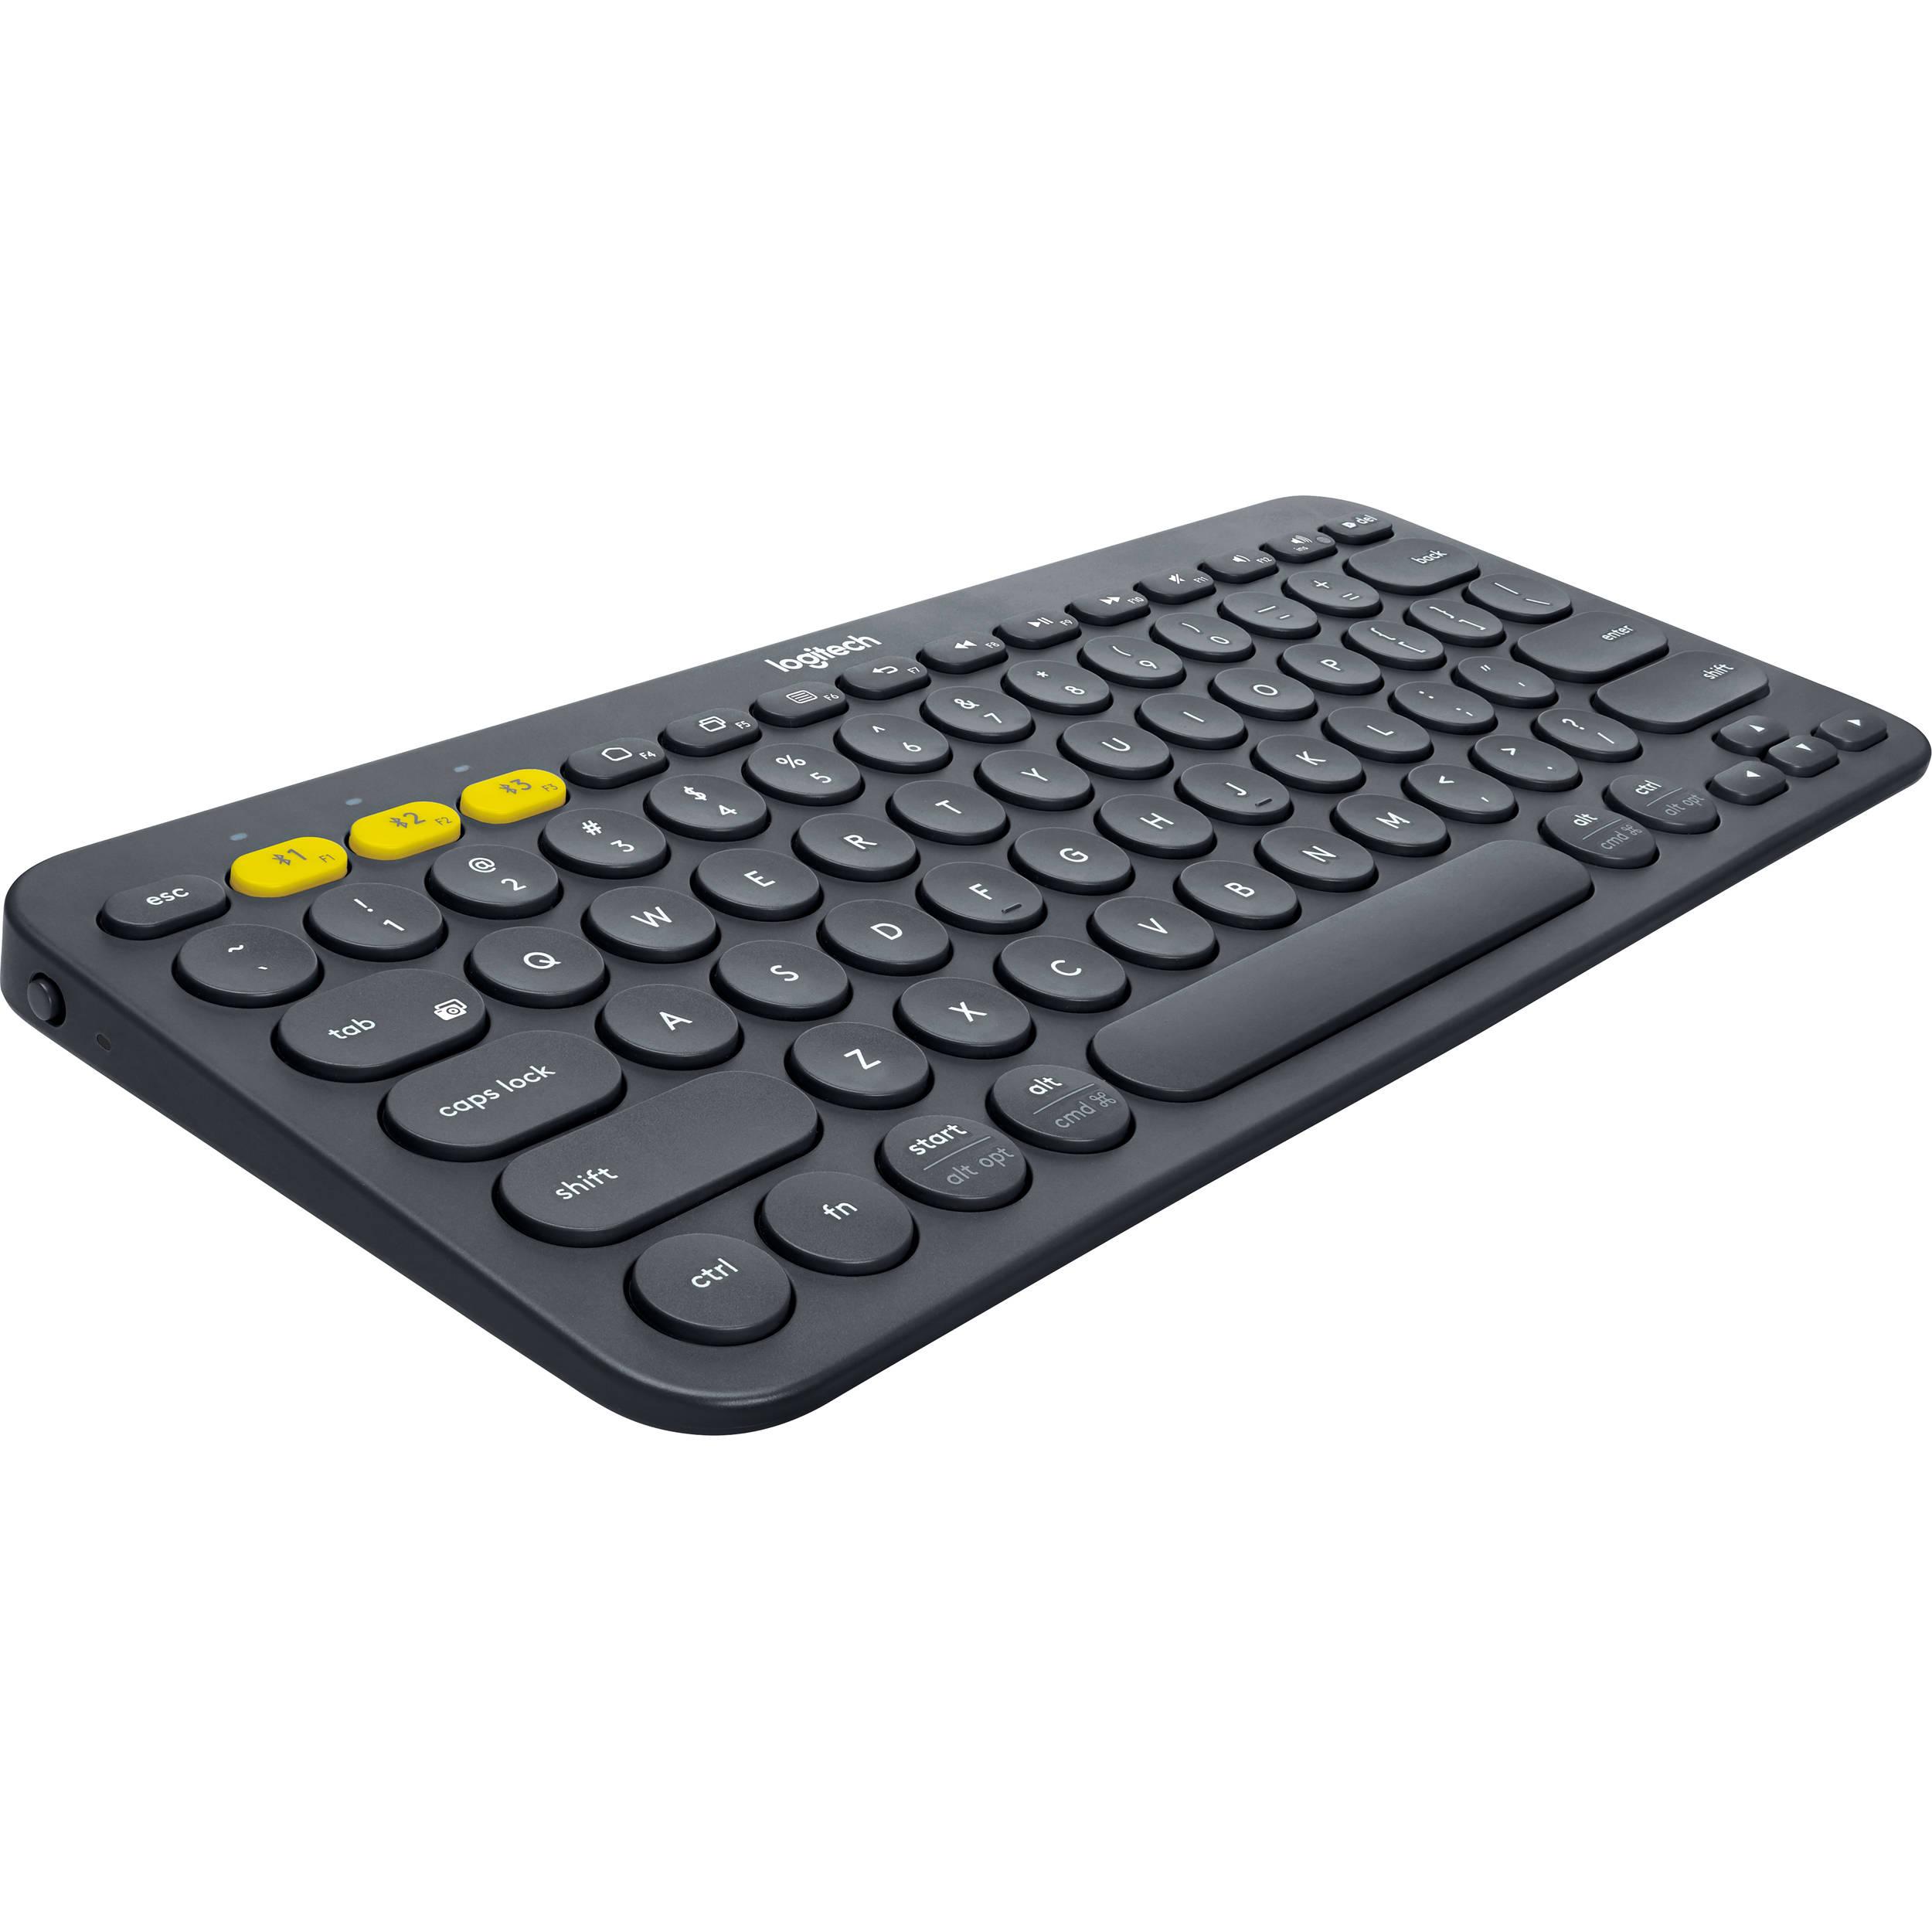 Logitech K380 Bluetooth Keyboard (Black)